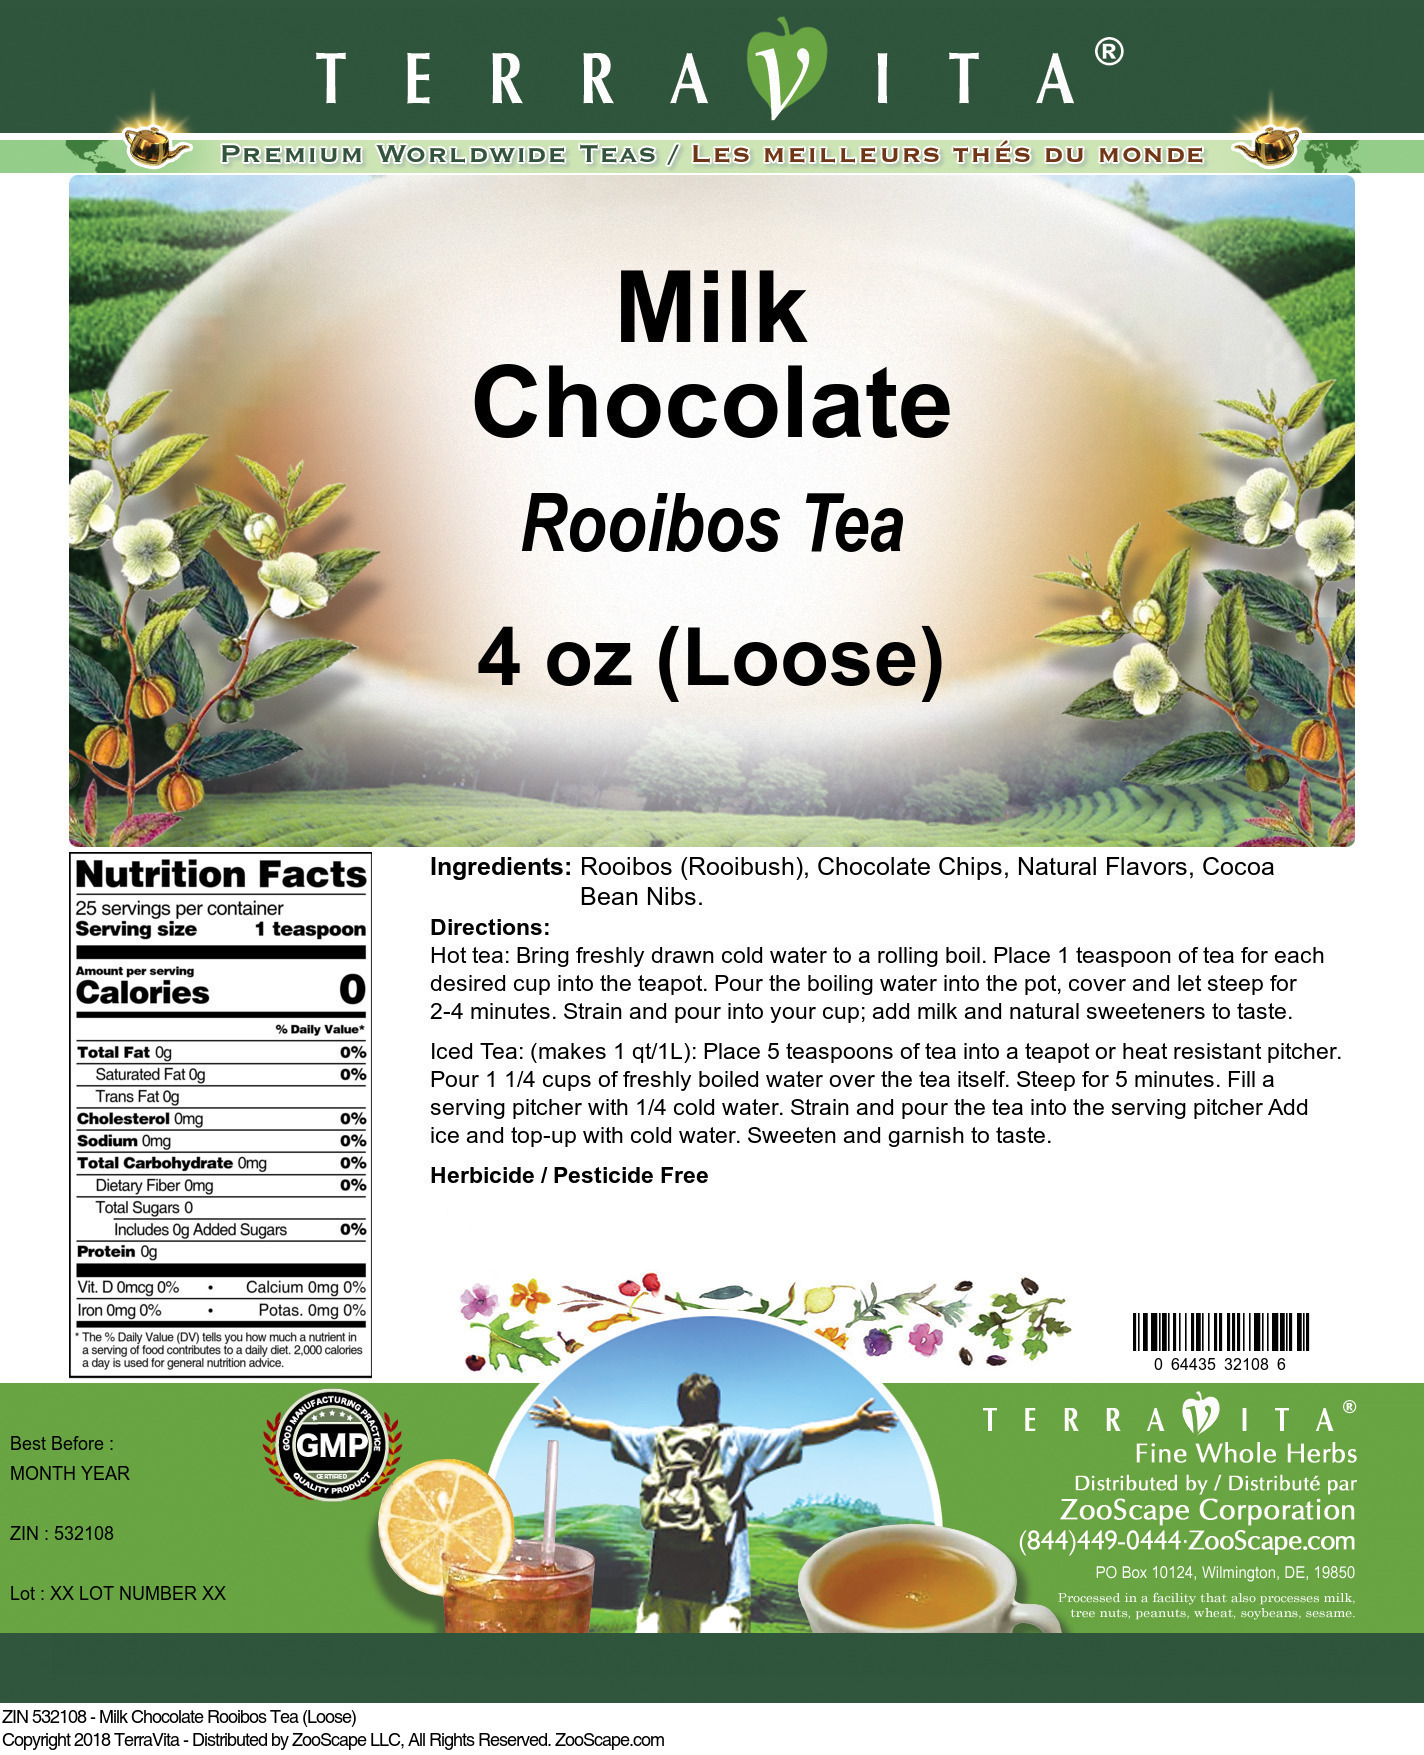 Milk Chocolate Rooibos Tea (Loose)